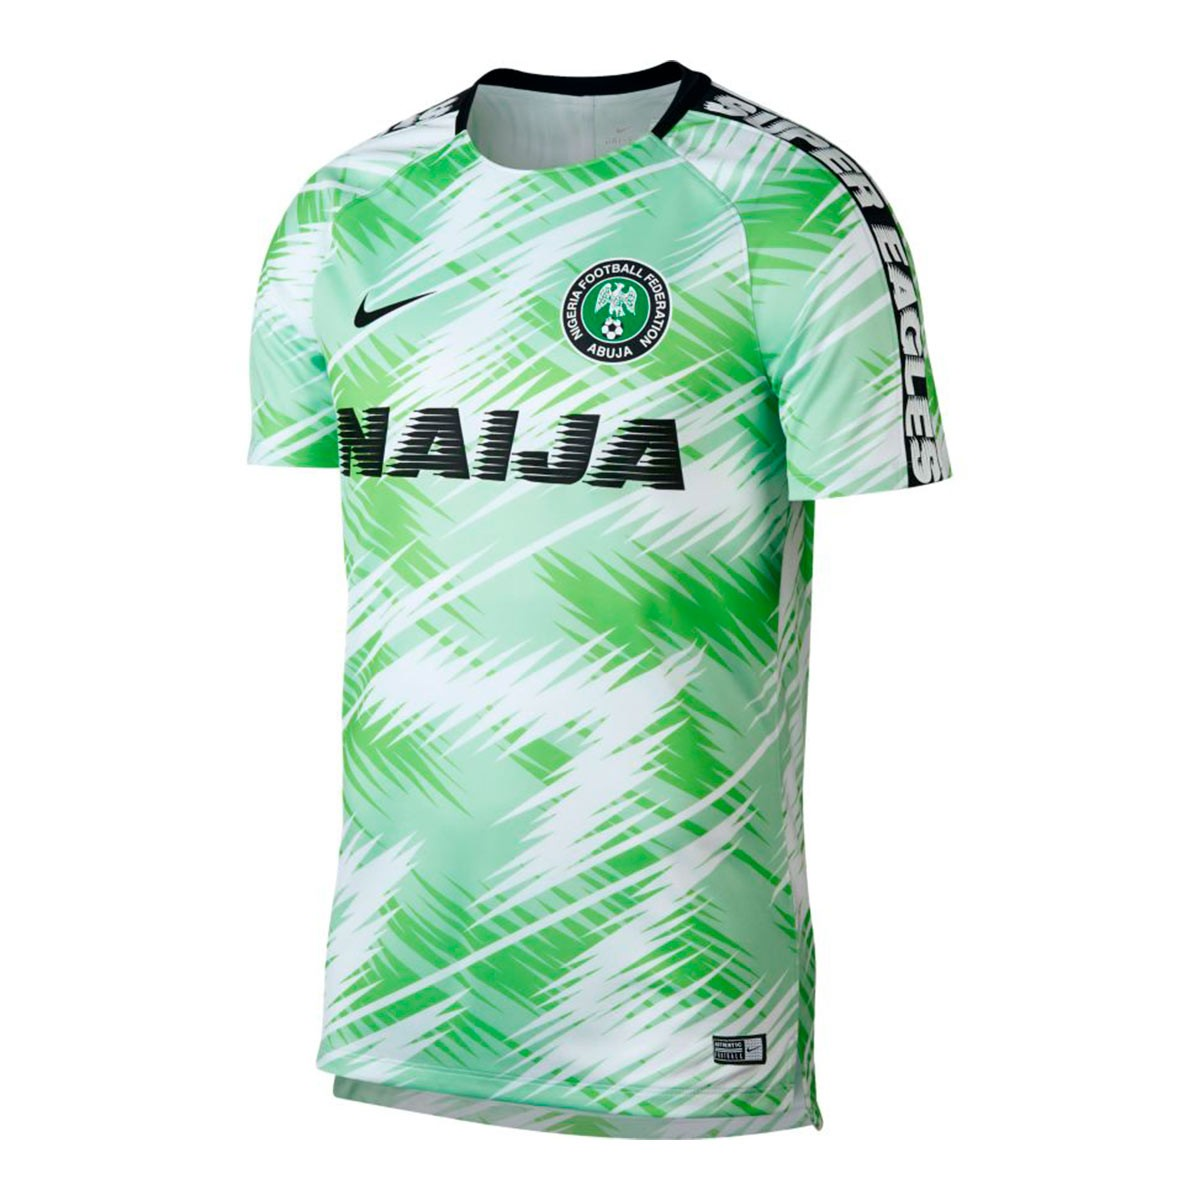 b076df8df26 Jersey Nike Nigeria Dry Squad GX 2018-2019 White-Black - Tienda de ...